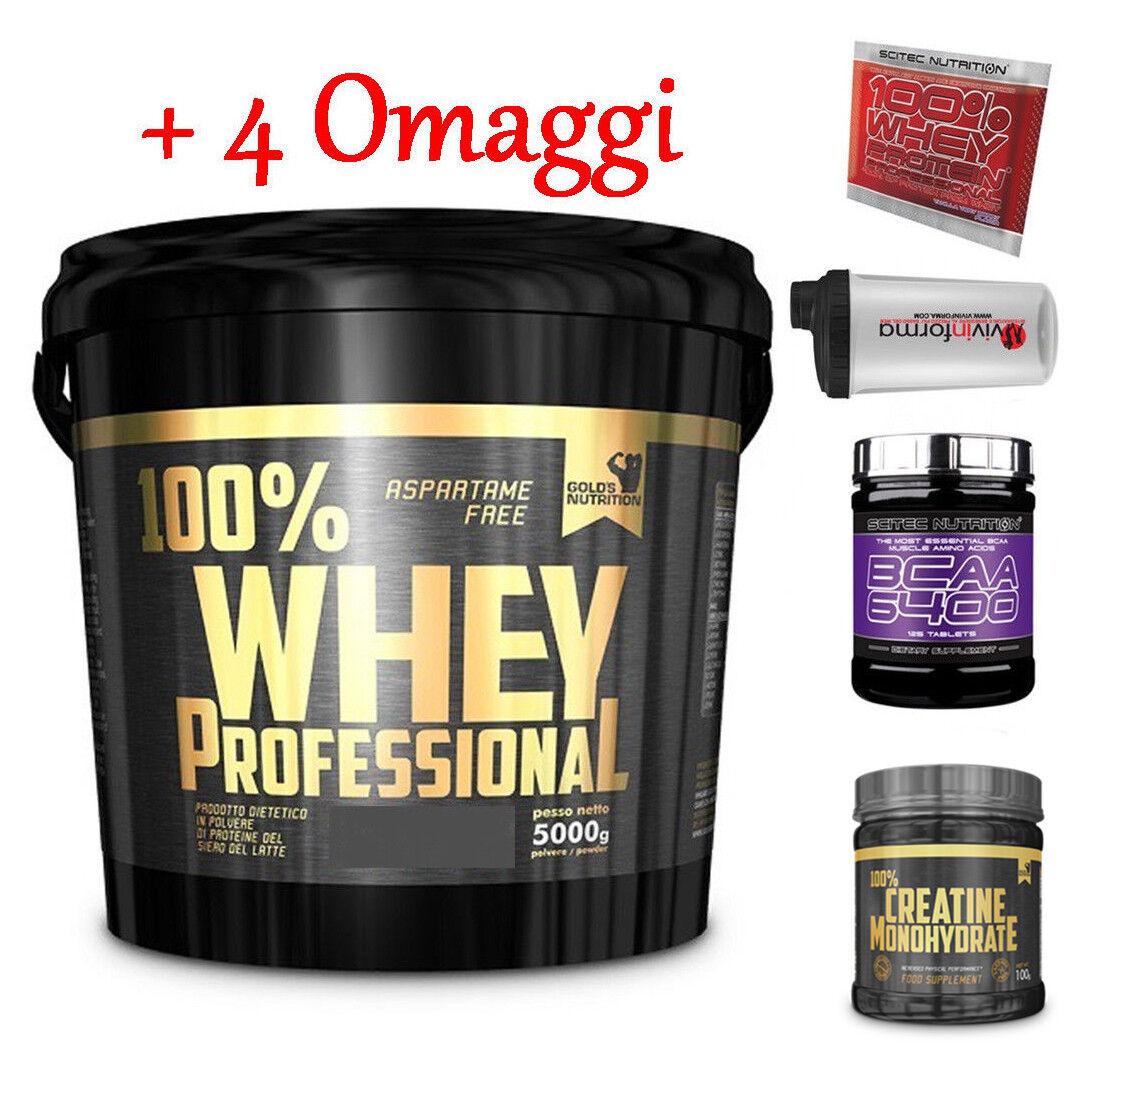 Gold's Nutrition 100% whey protein professional 5 kg proteine siero+ siero+ proteine bcaa scitec d442aa